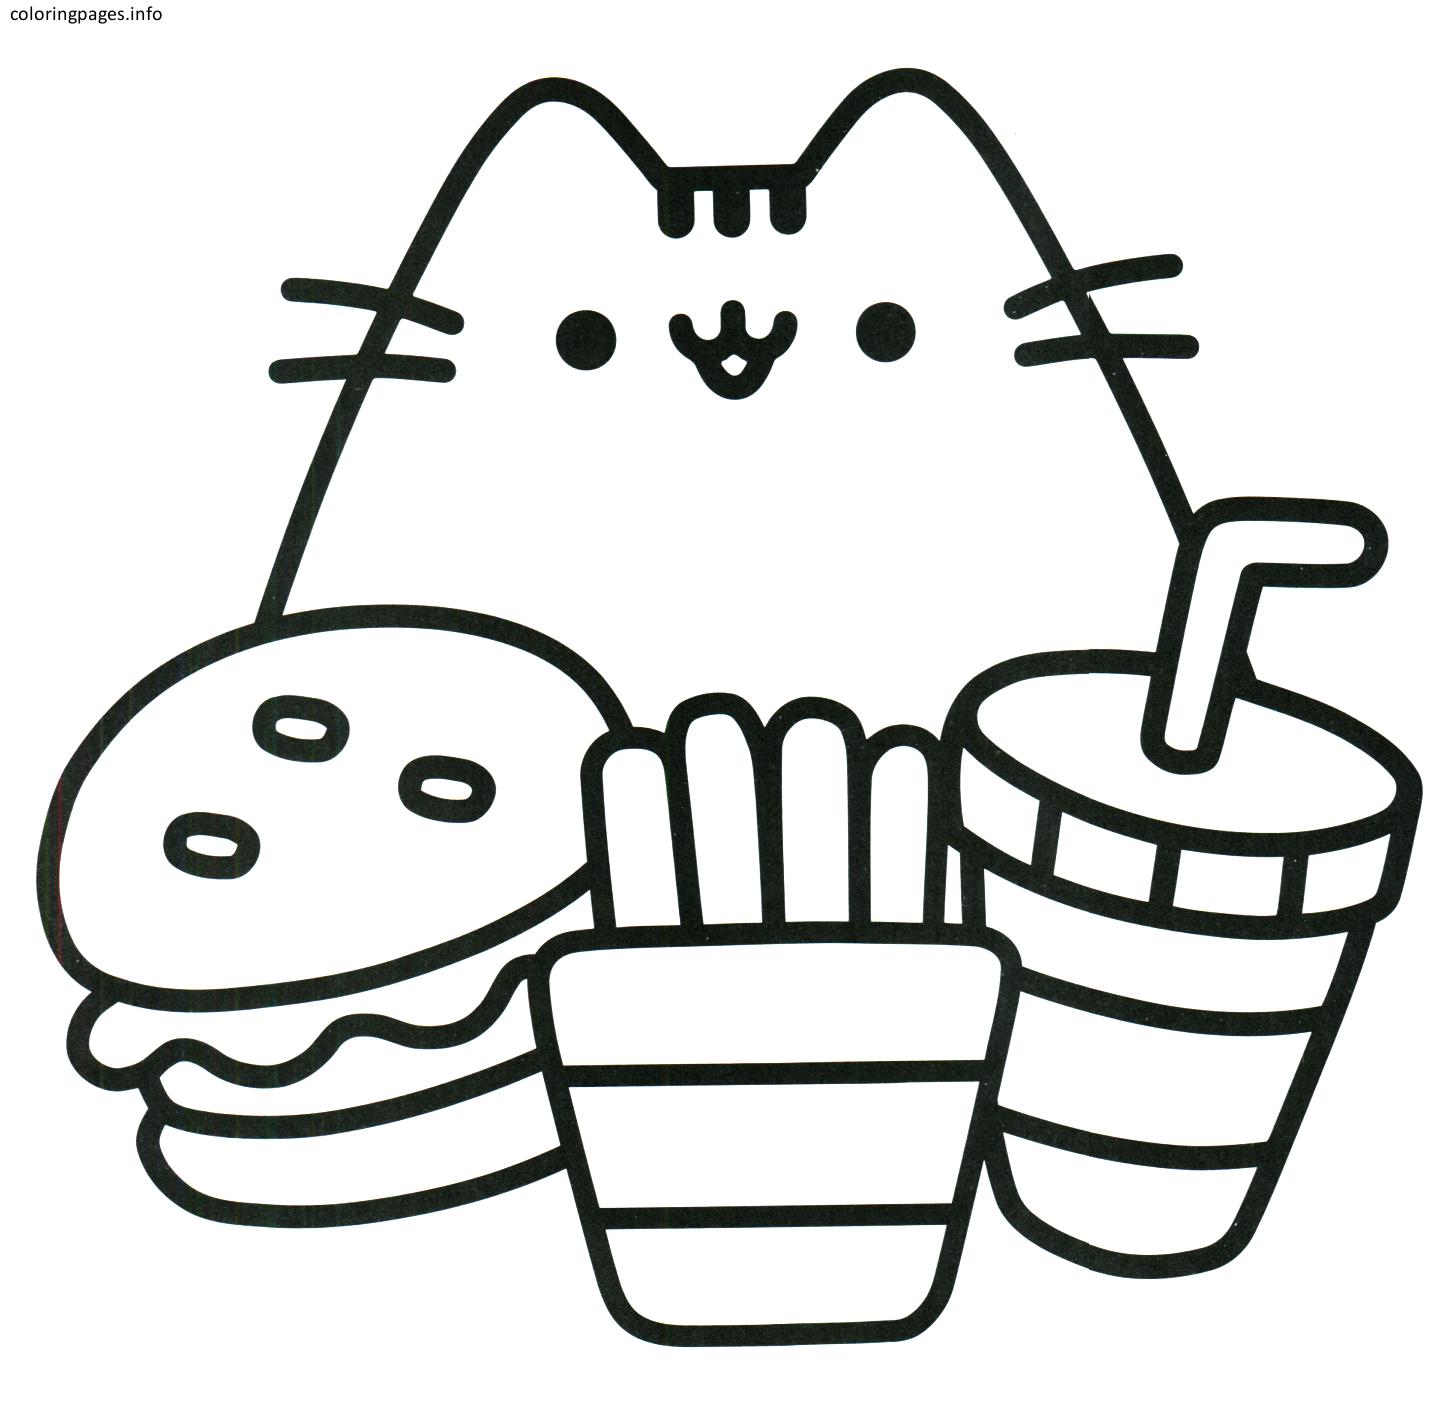 kawaii pusheen cat coloring pages pusheen